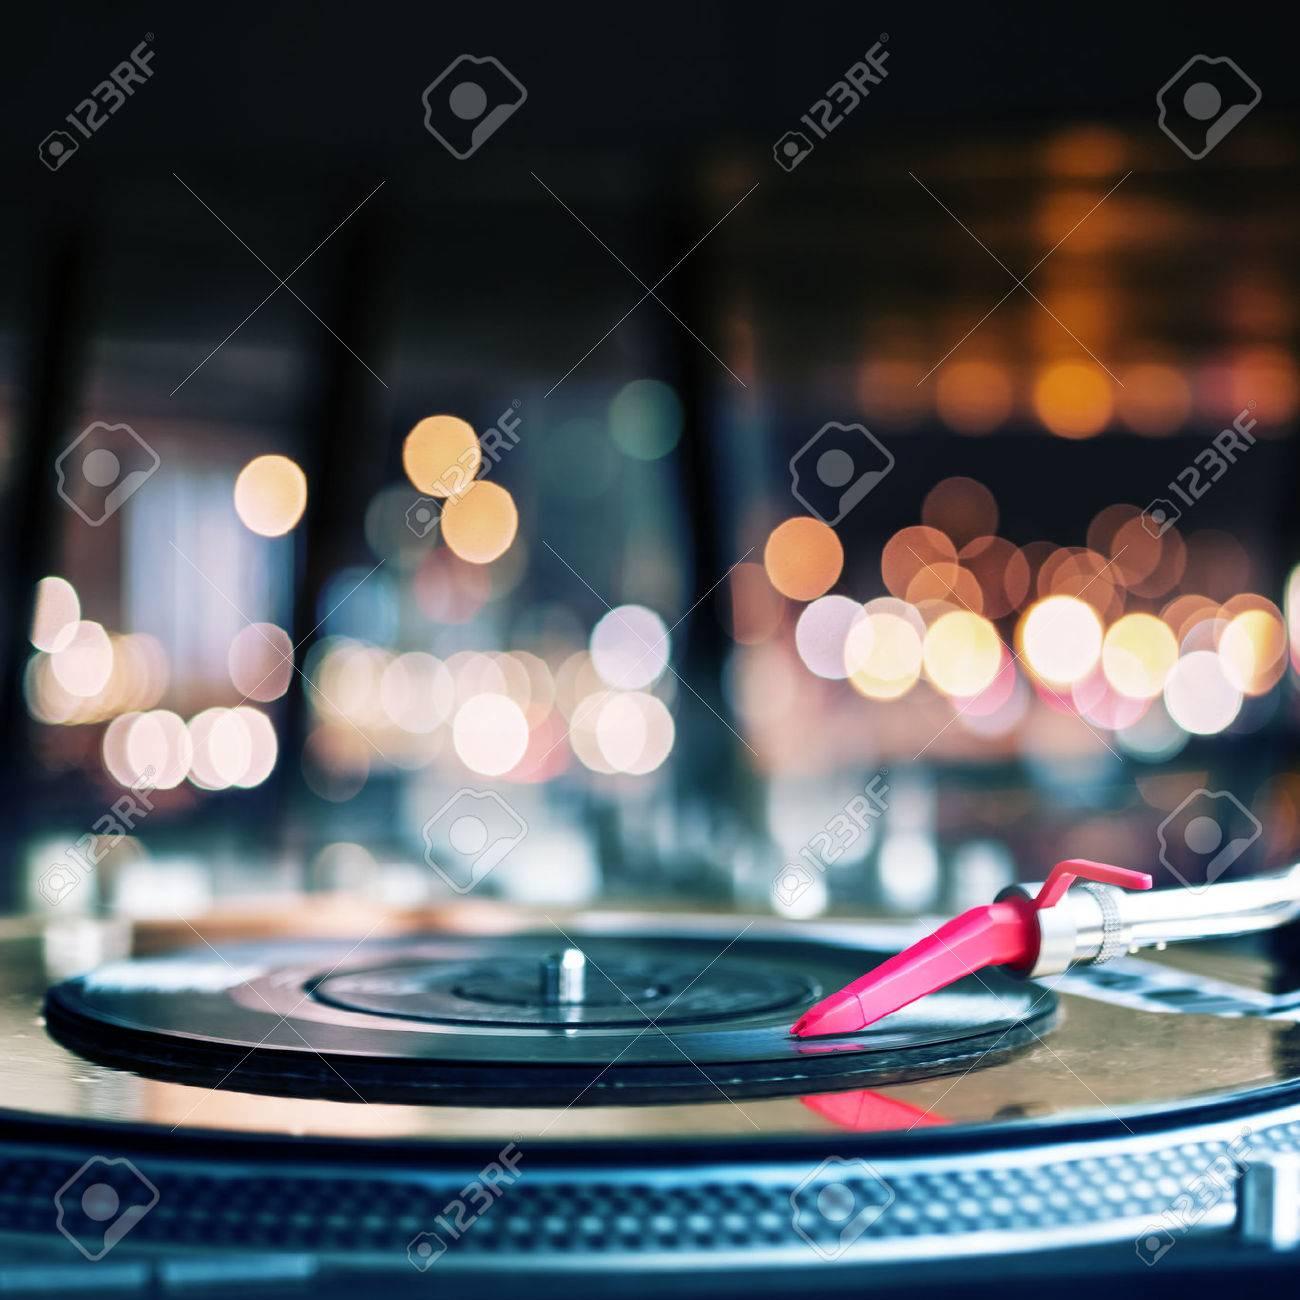 Vinyl record spinning on DJ turntable Stock Photo - 35064773